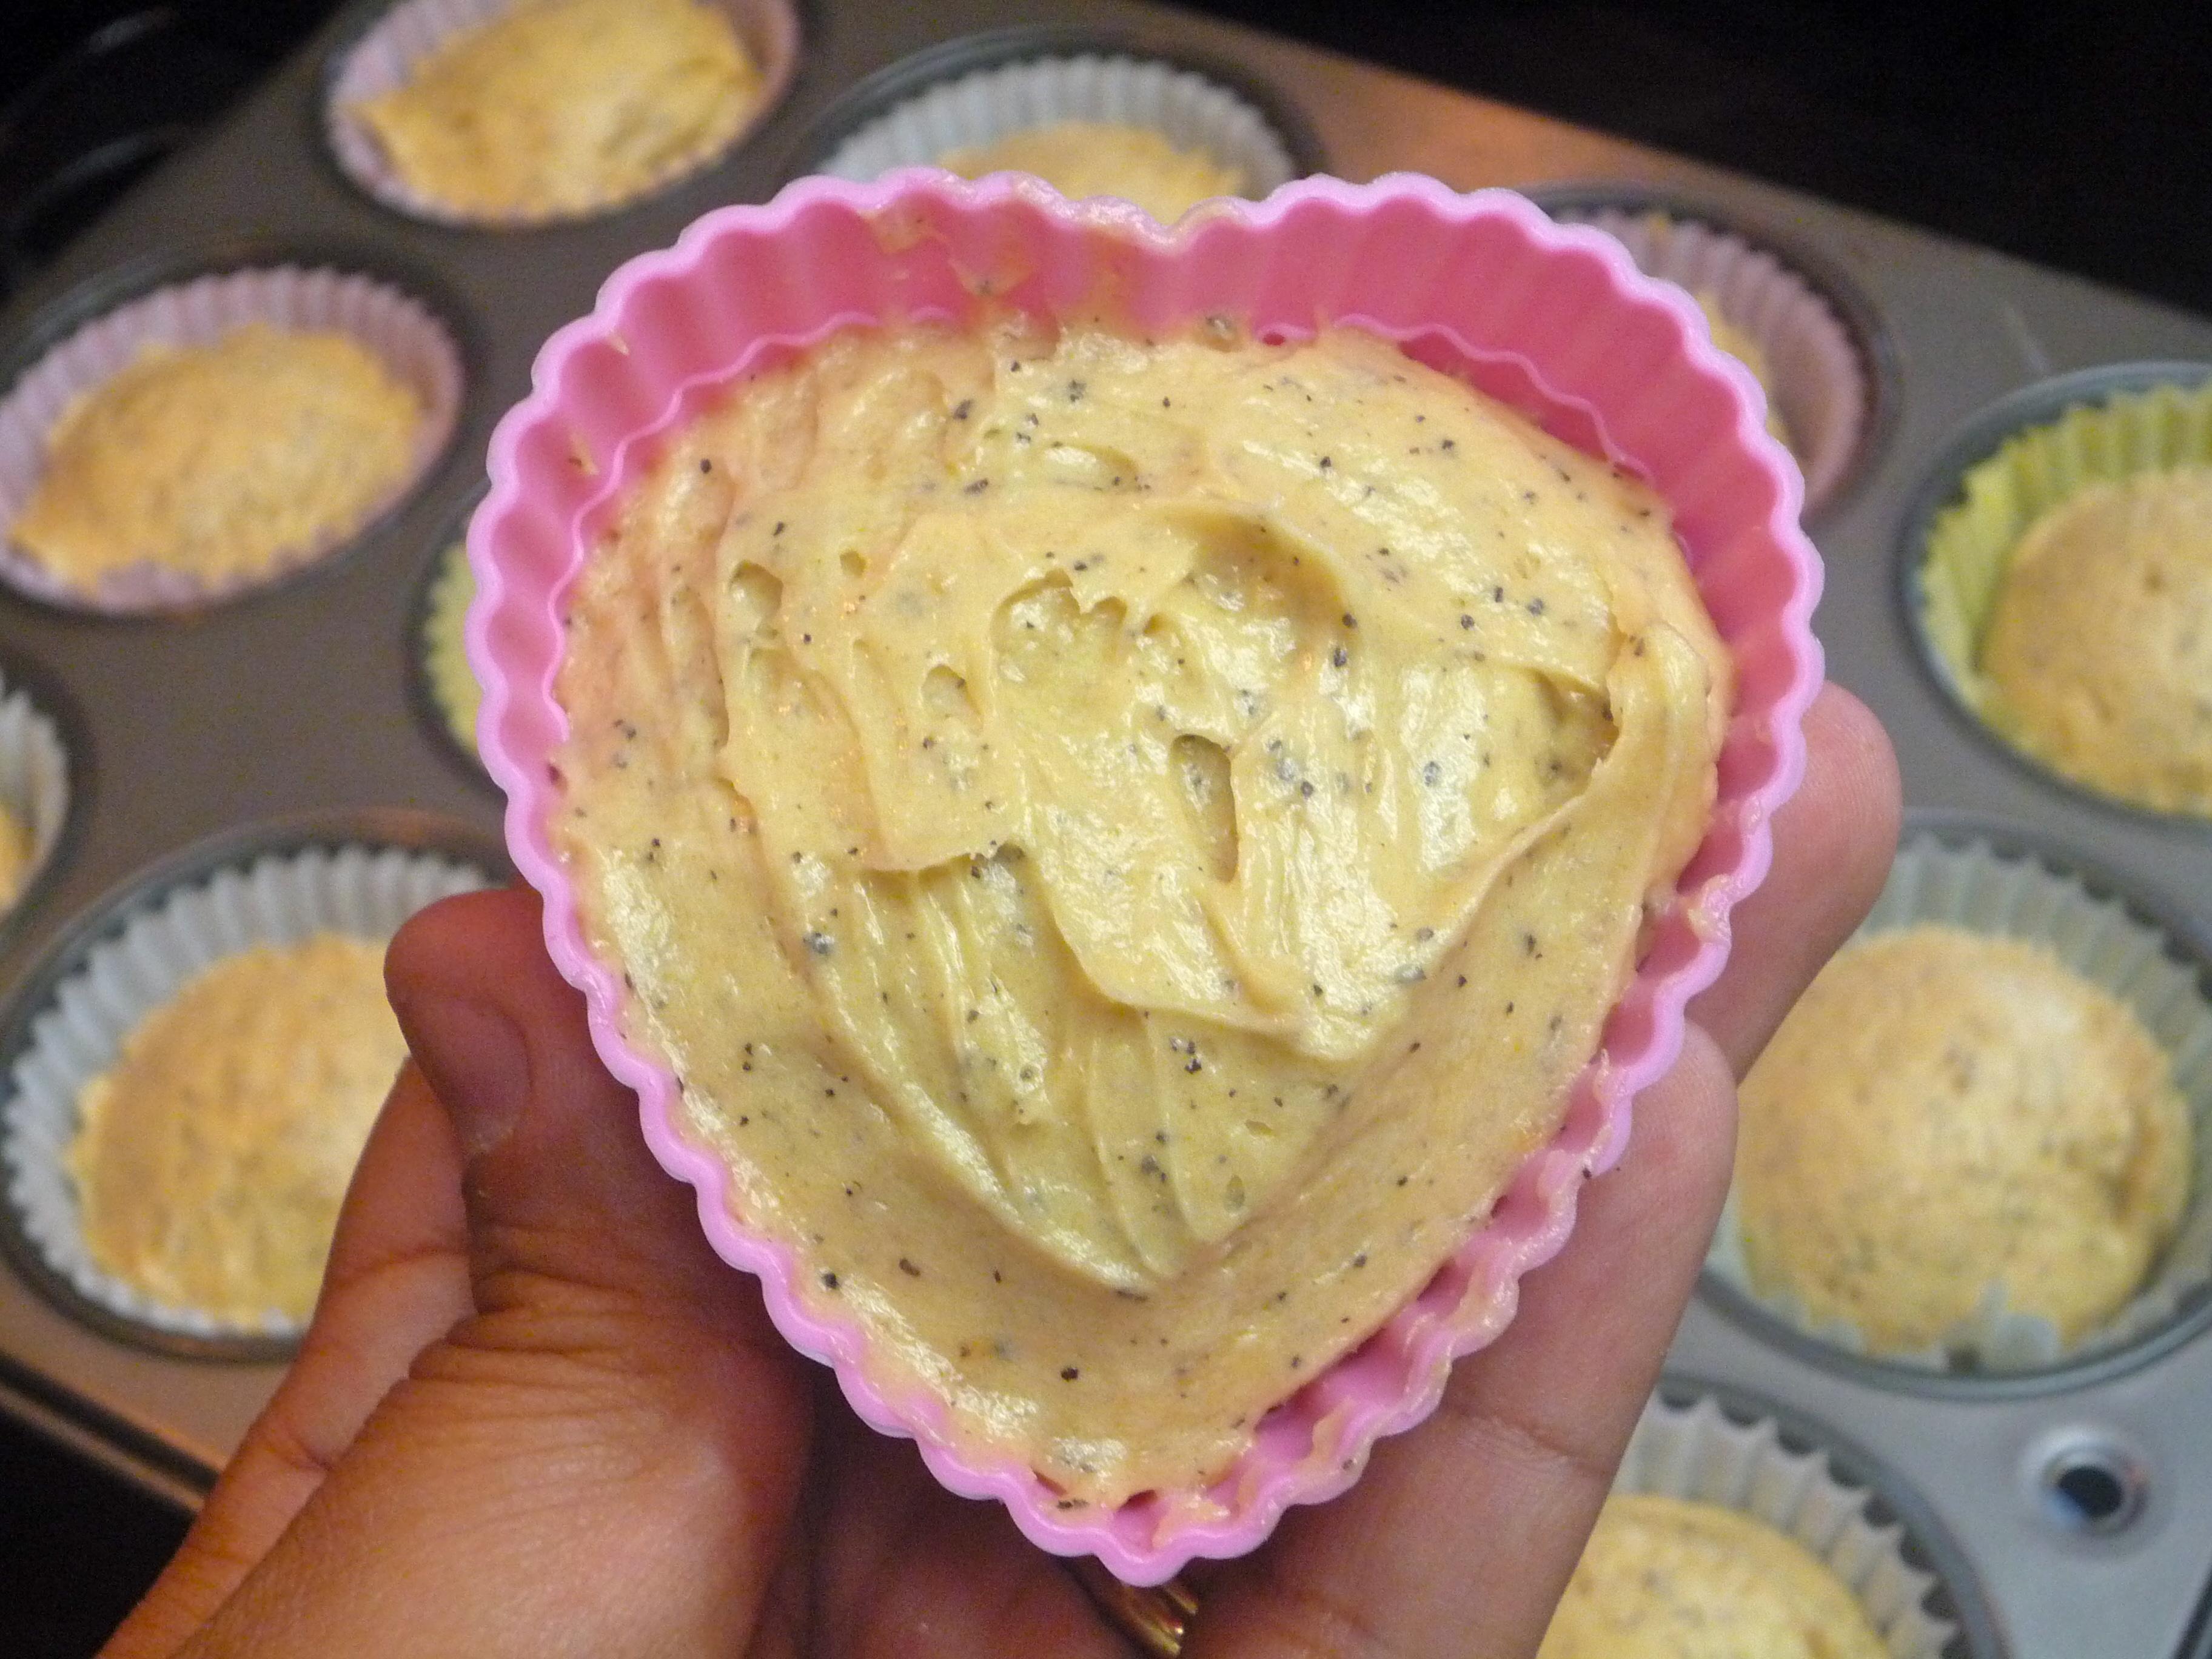 ... dough ice cream pumpkin cookie dough ice cream earl grey and lemon